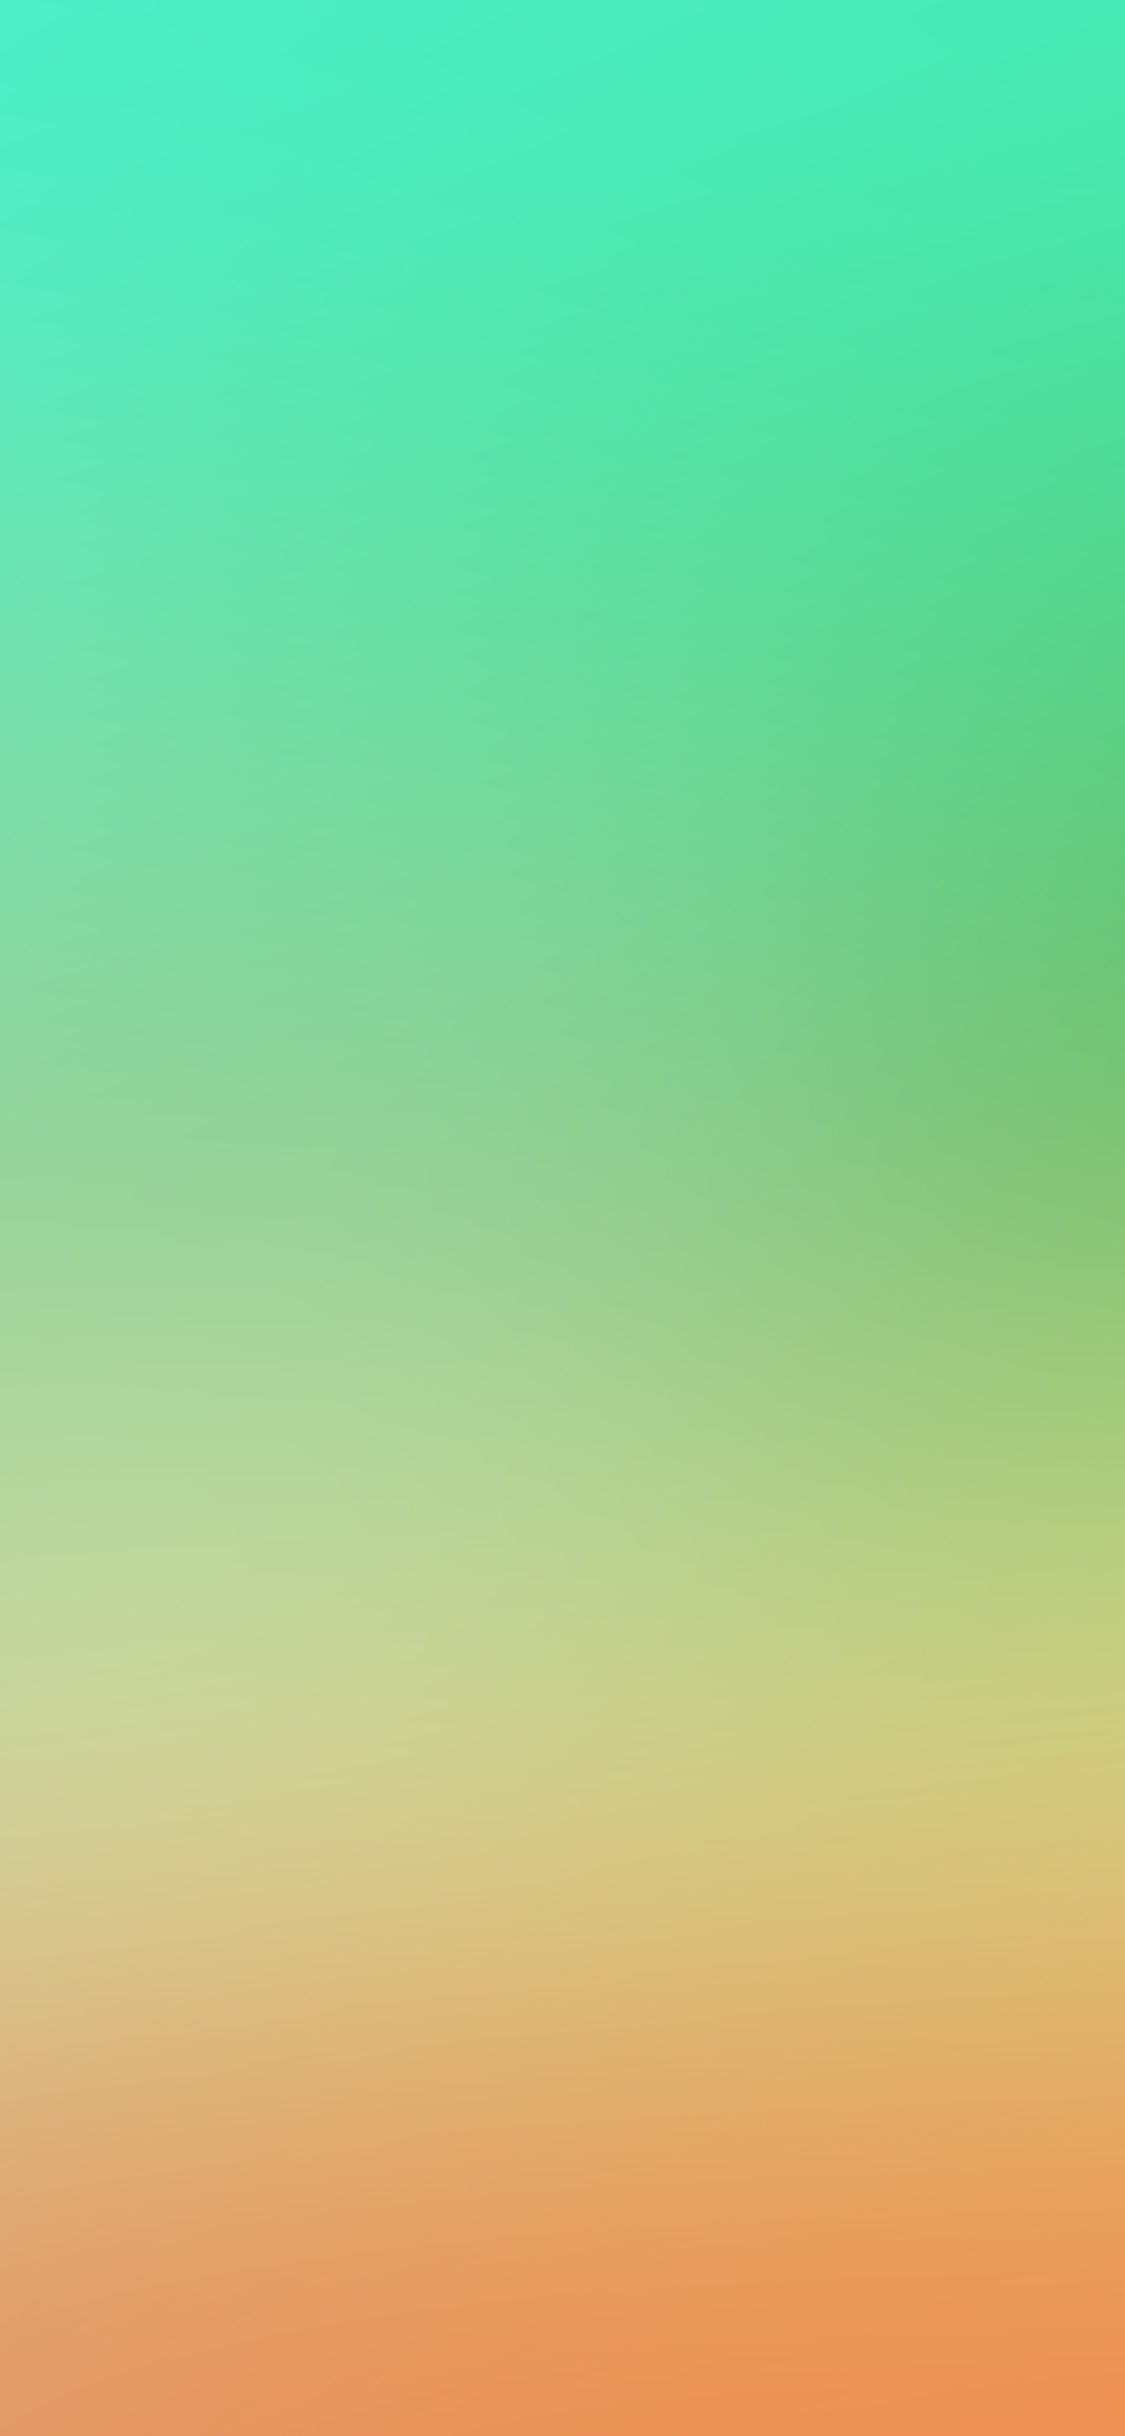 iPhoneXpapers.com-Apple-iPhone-wallpaper-sl29-soft-green-orange-blur-gradation